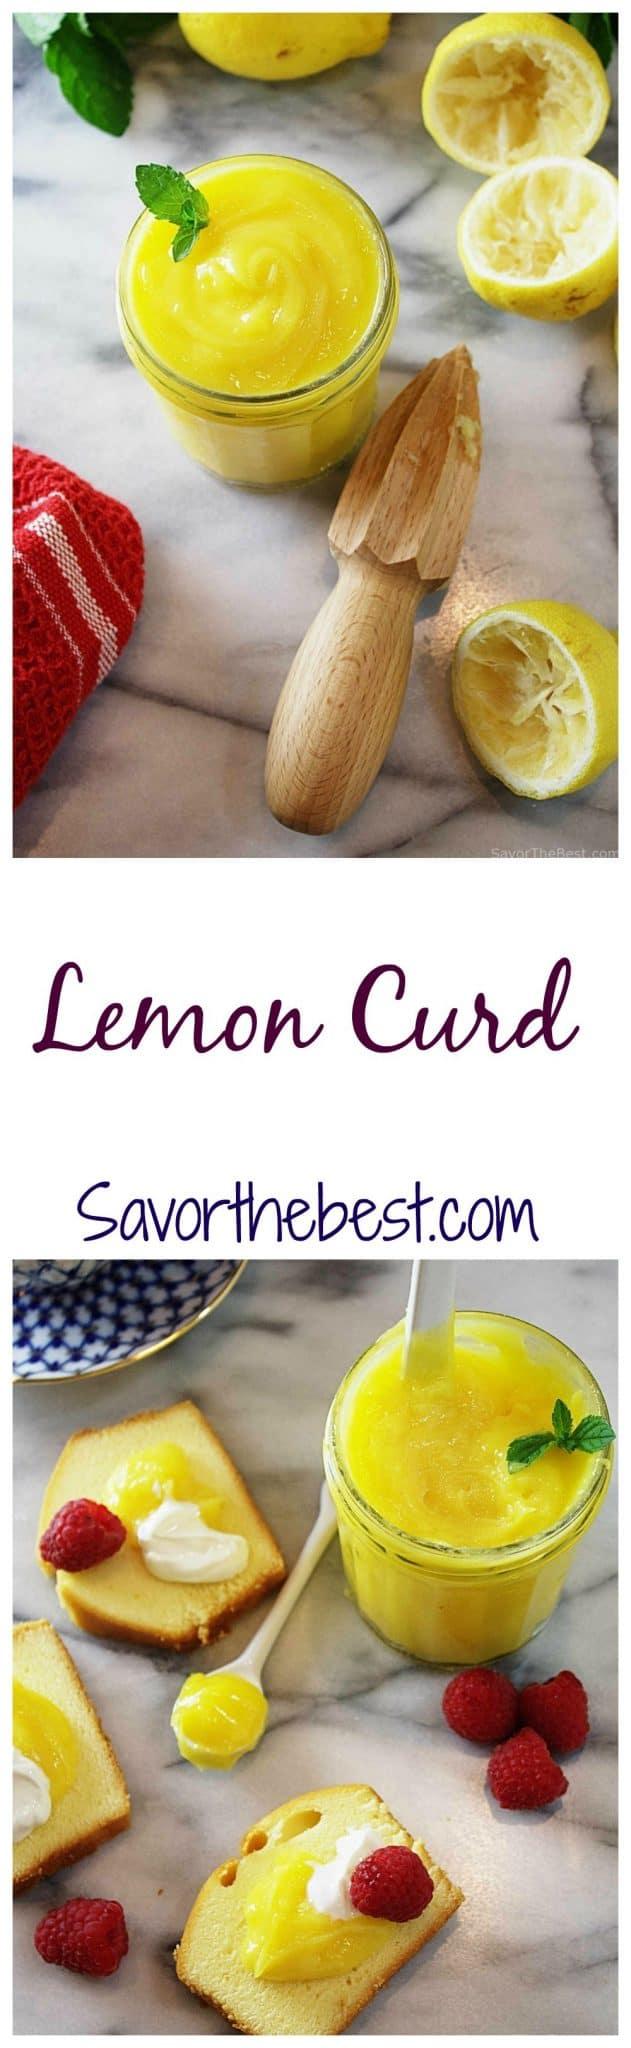 Rich Lemon Curd